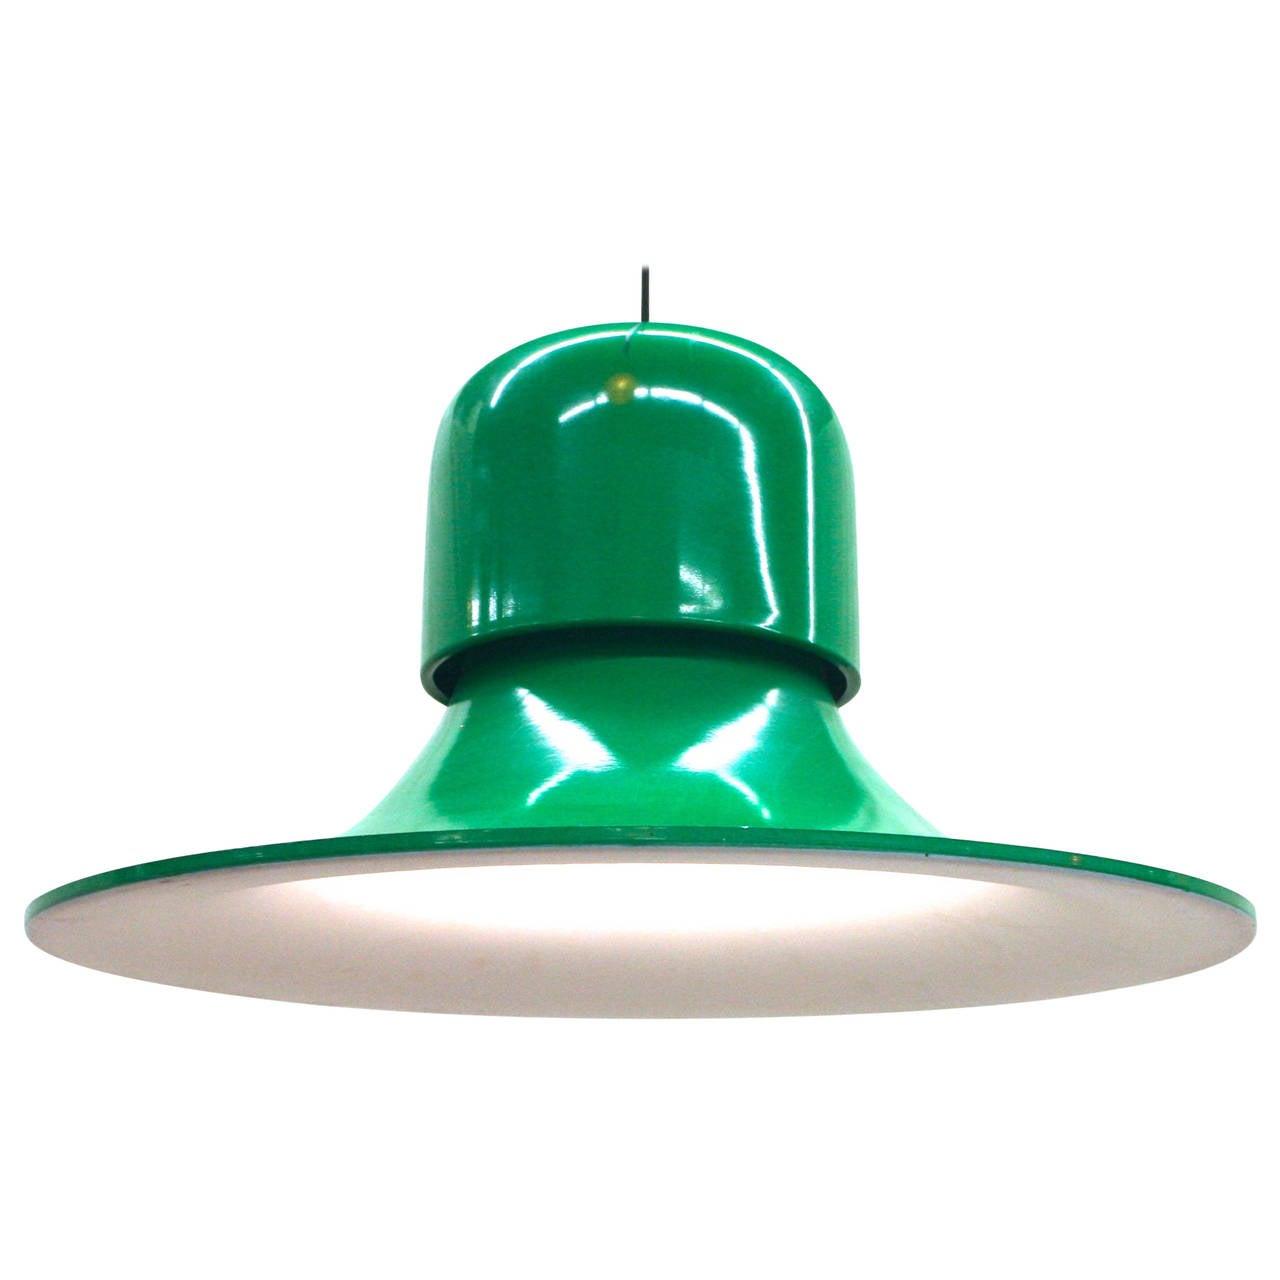 italian pendant lighting. stilnovo emerald green enamel bellshaped italian pendant light 1 lighting l